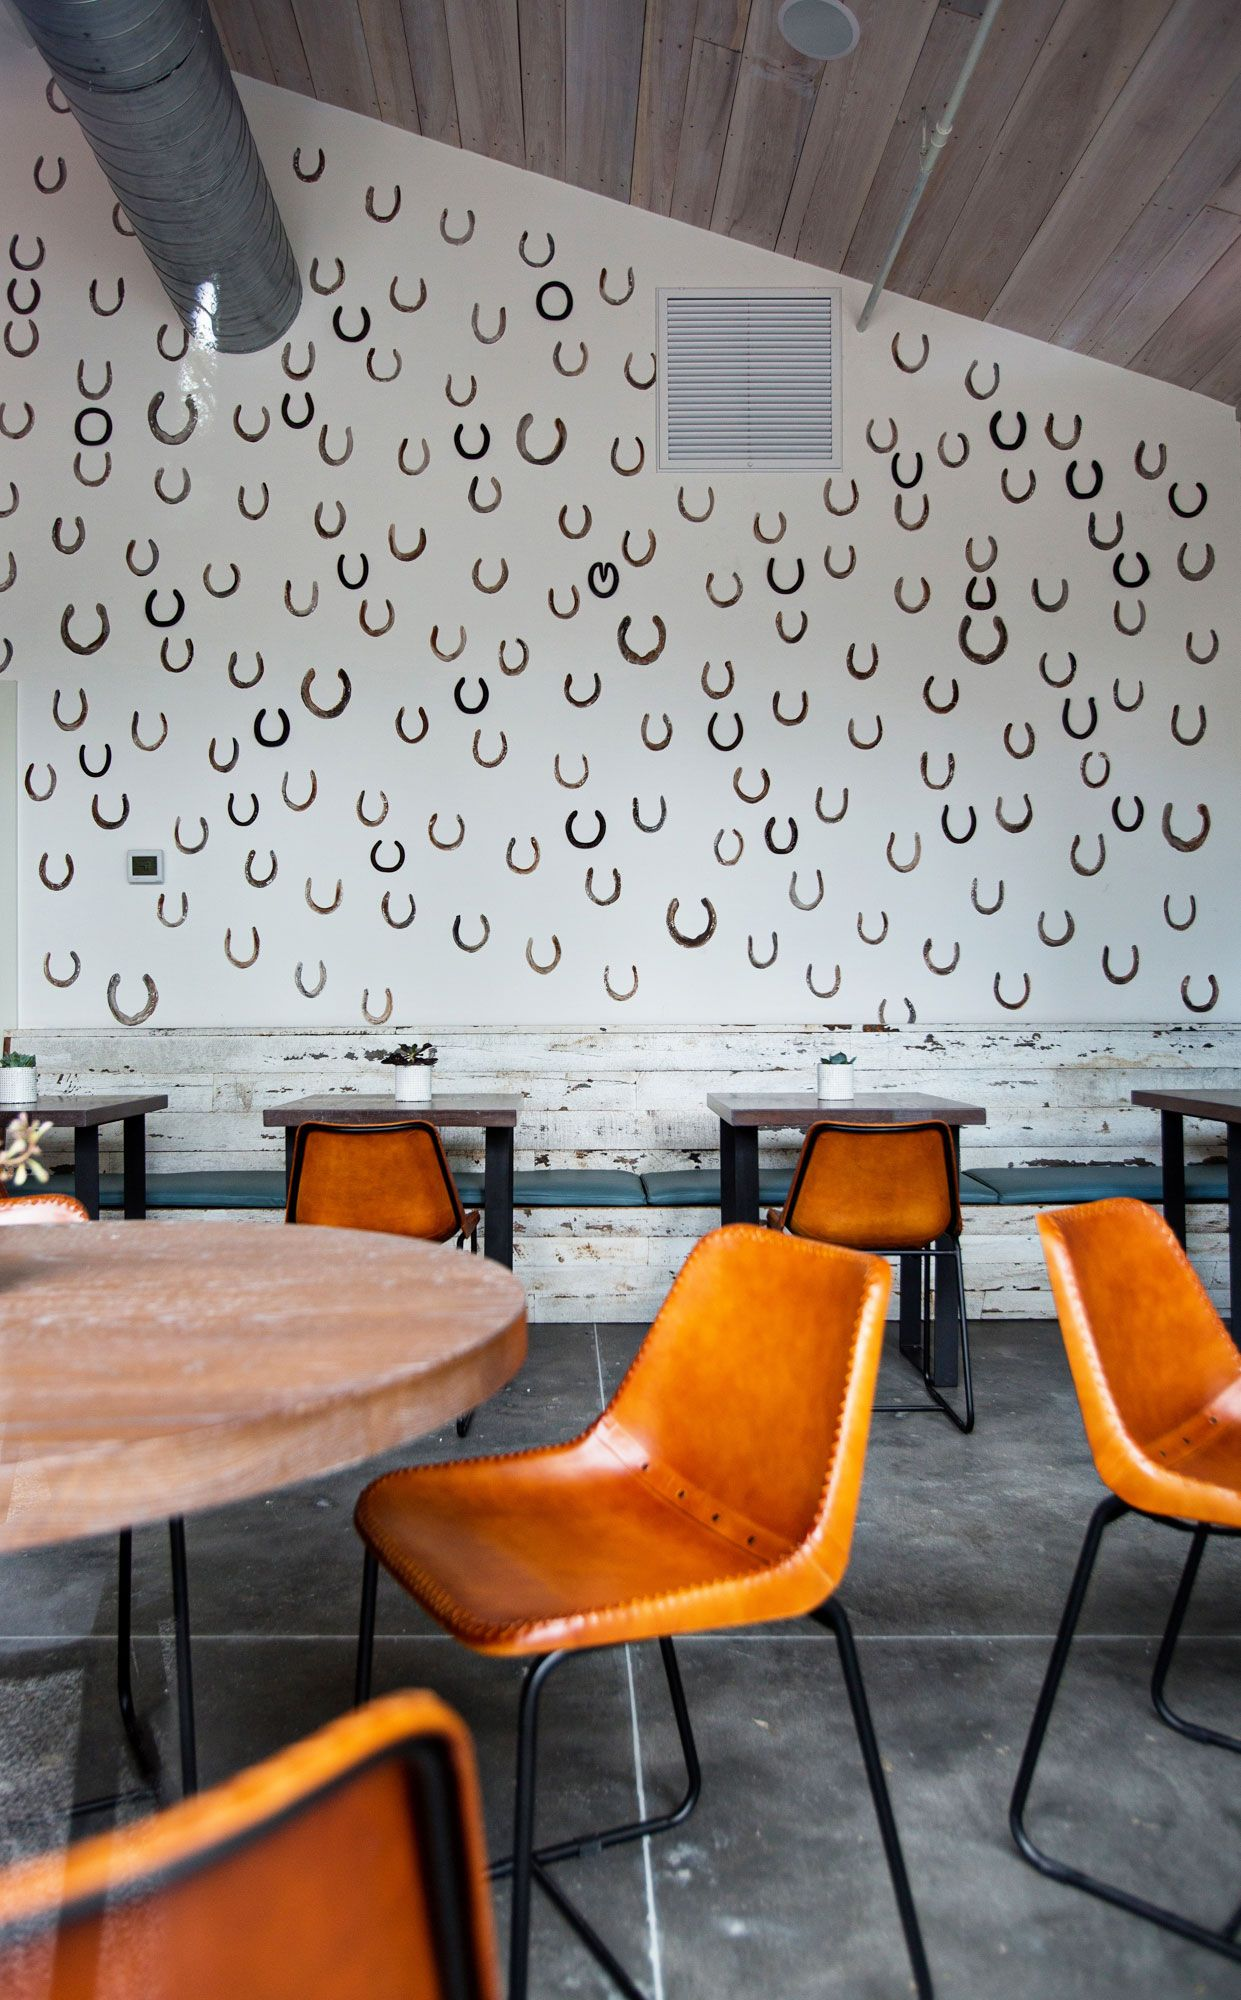 Lewis Barbecue In Charleston Sc Rue Eclectic Restaurant Ideas Interiors